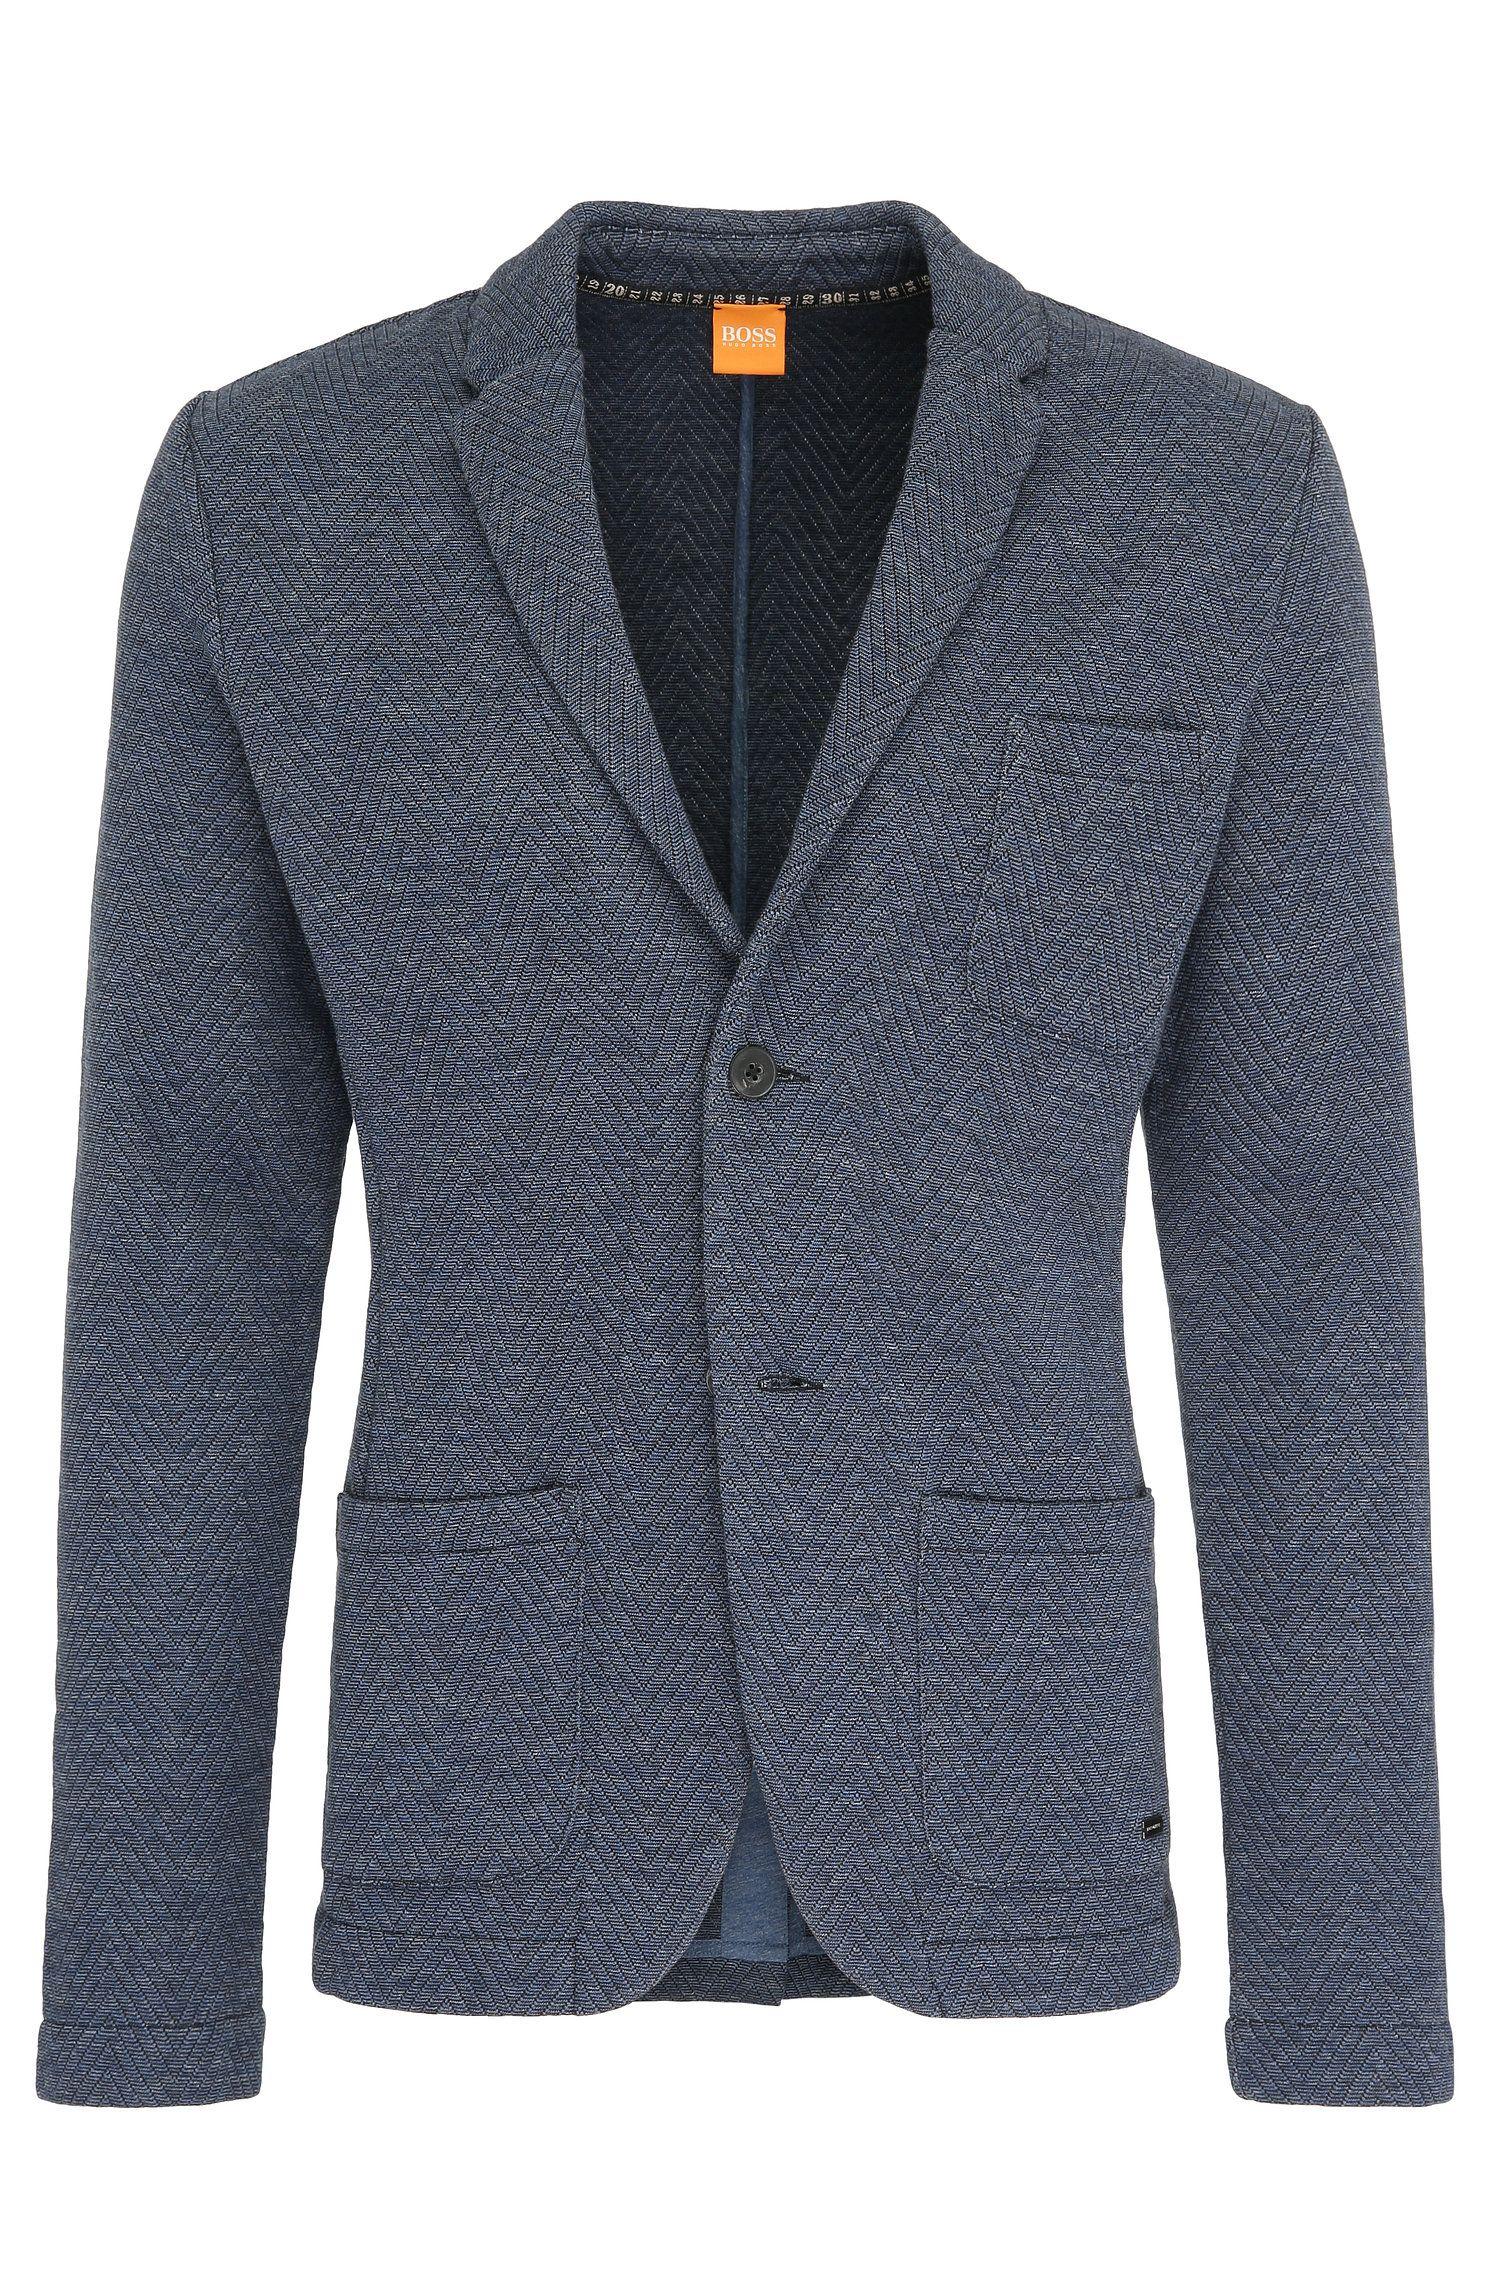 'Ward' | Slim Fit, Cotton Blend Bonded Jersey Sport Coat